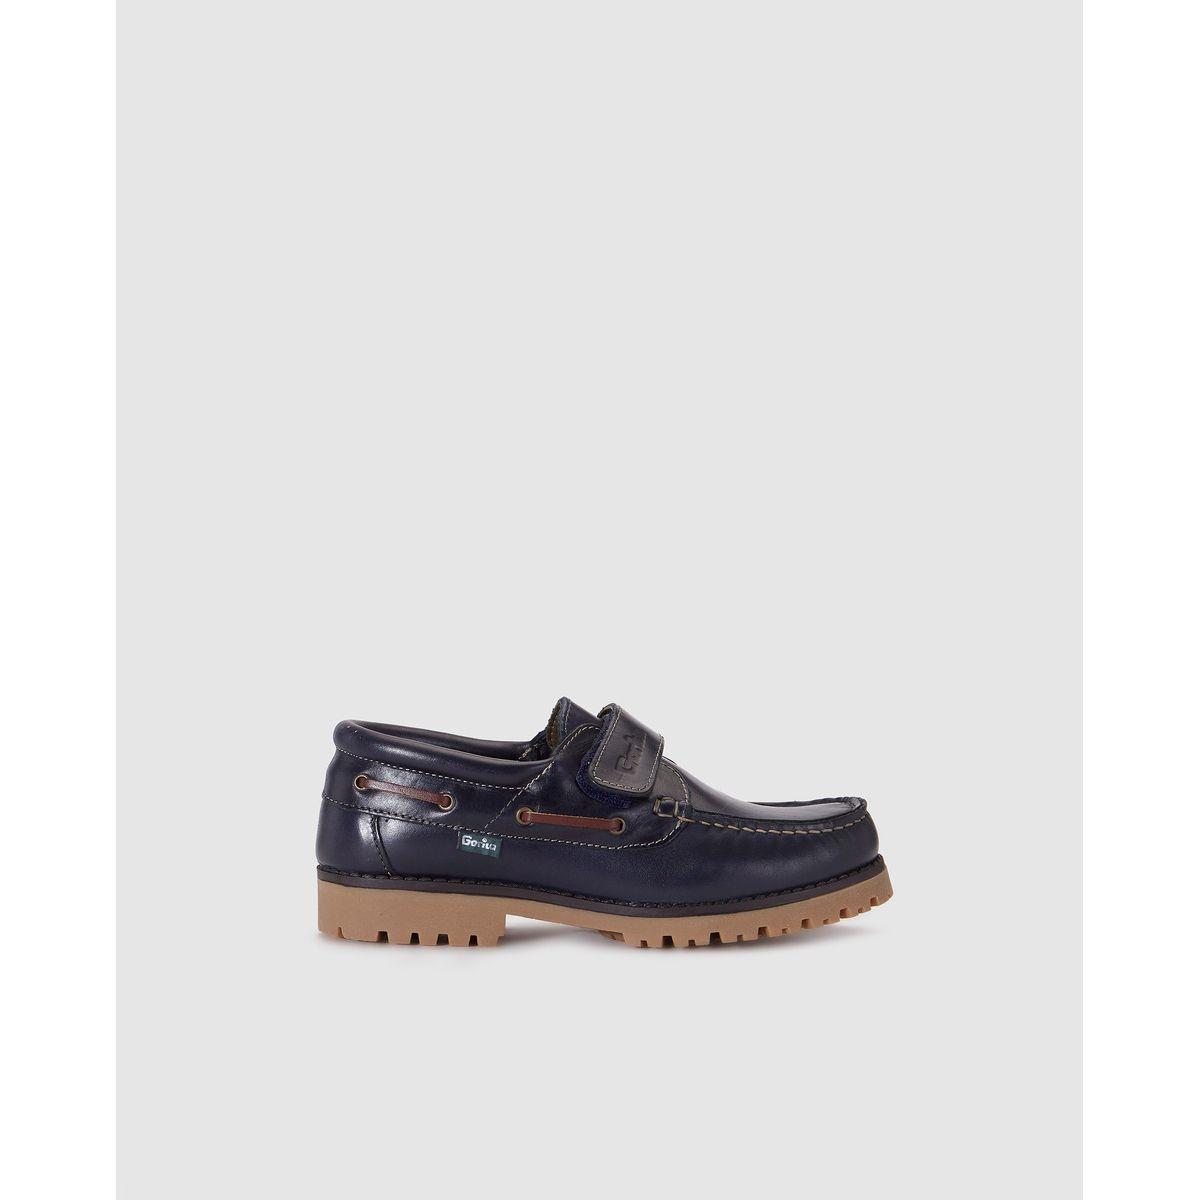 Chaussures bateau  bleu